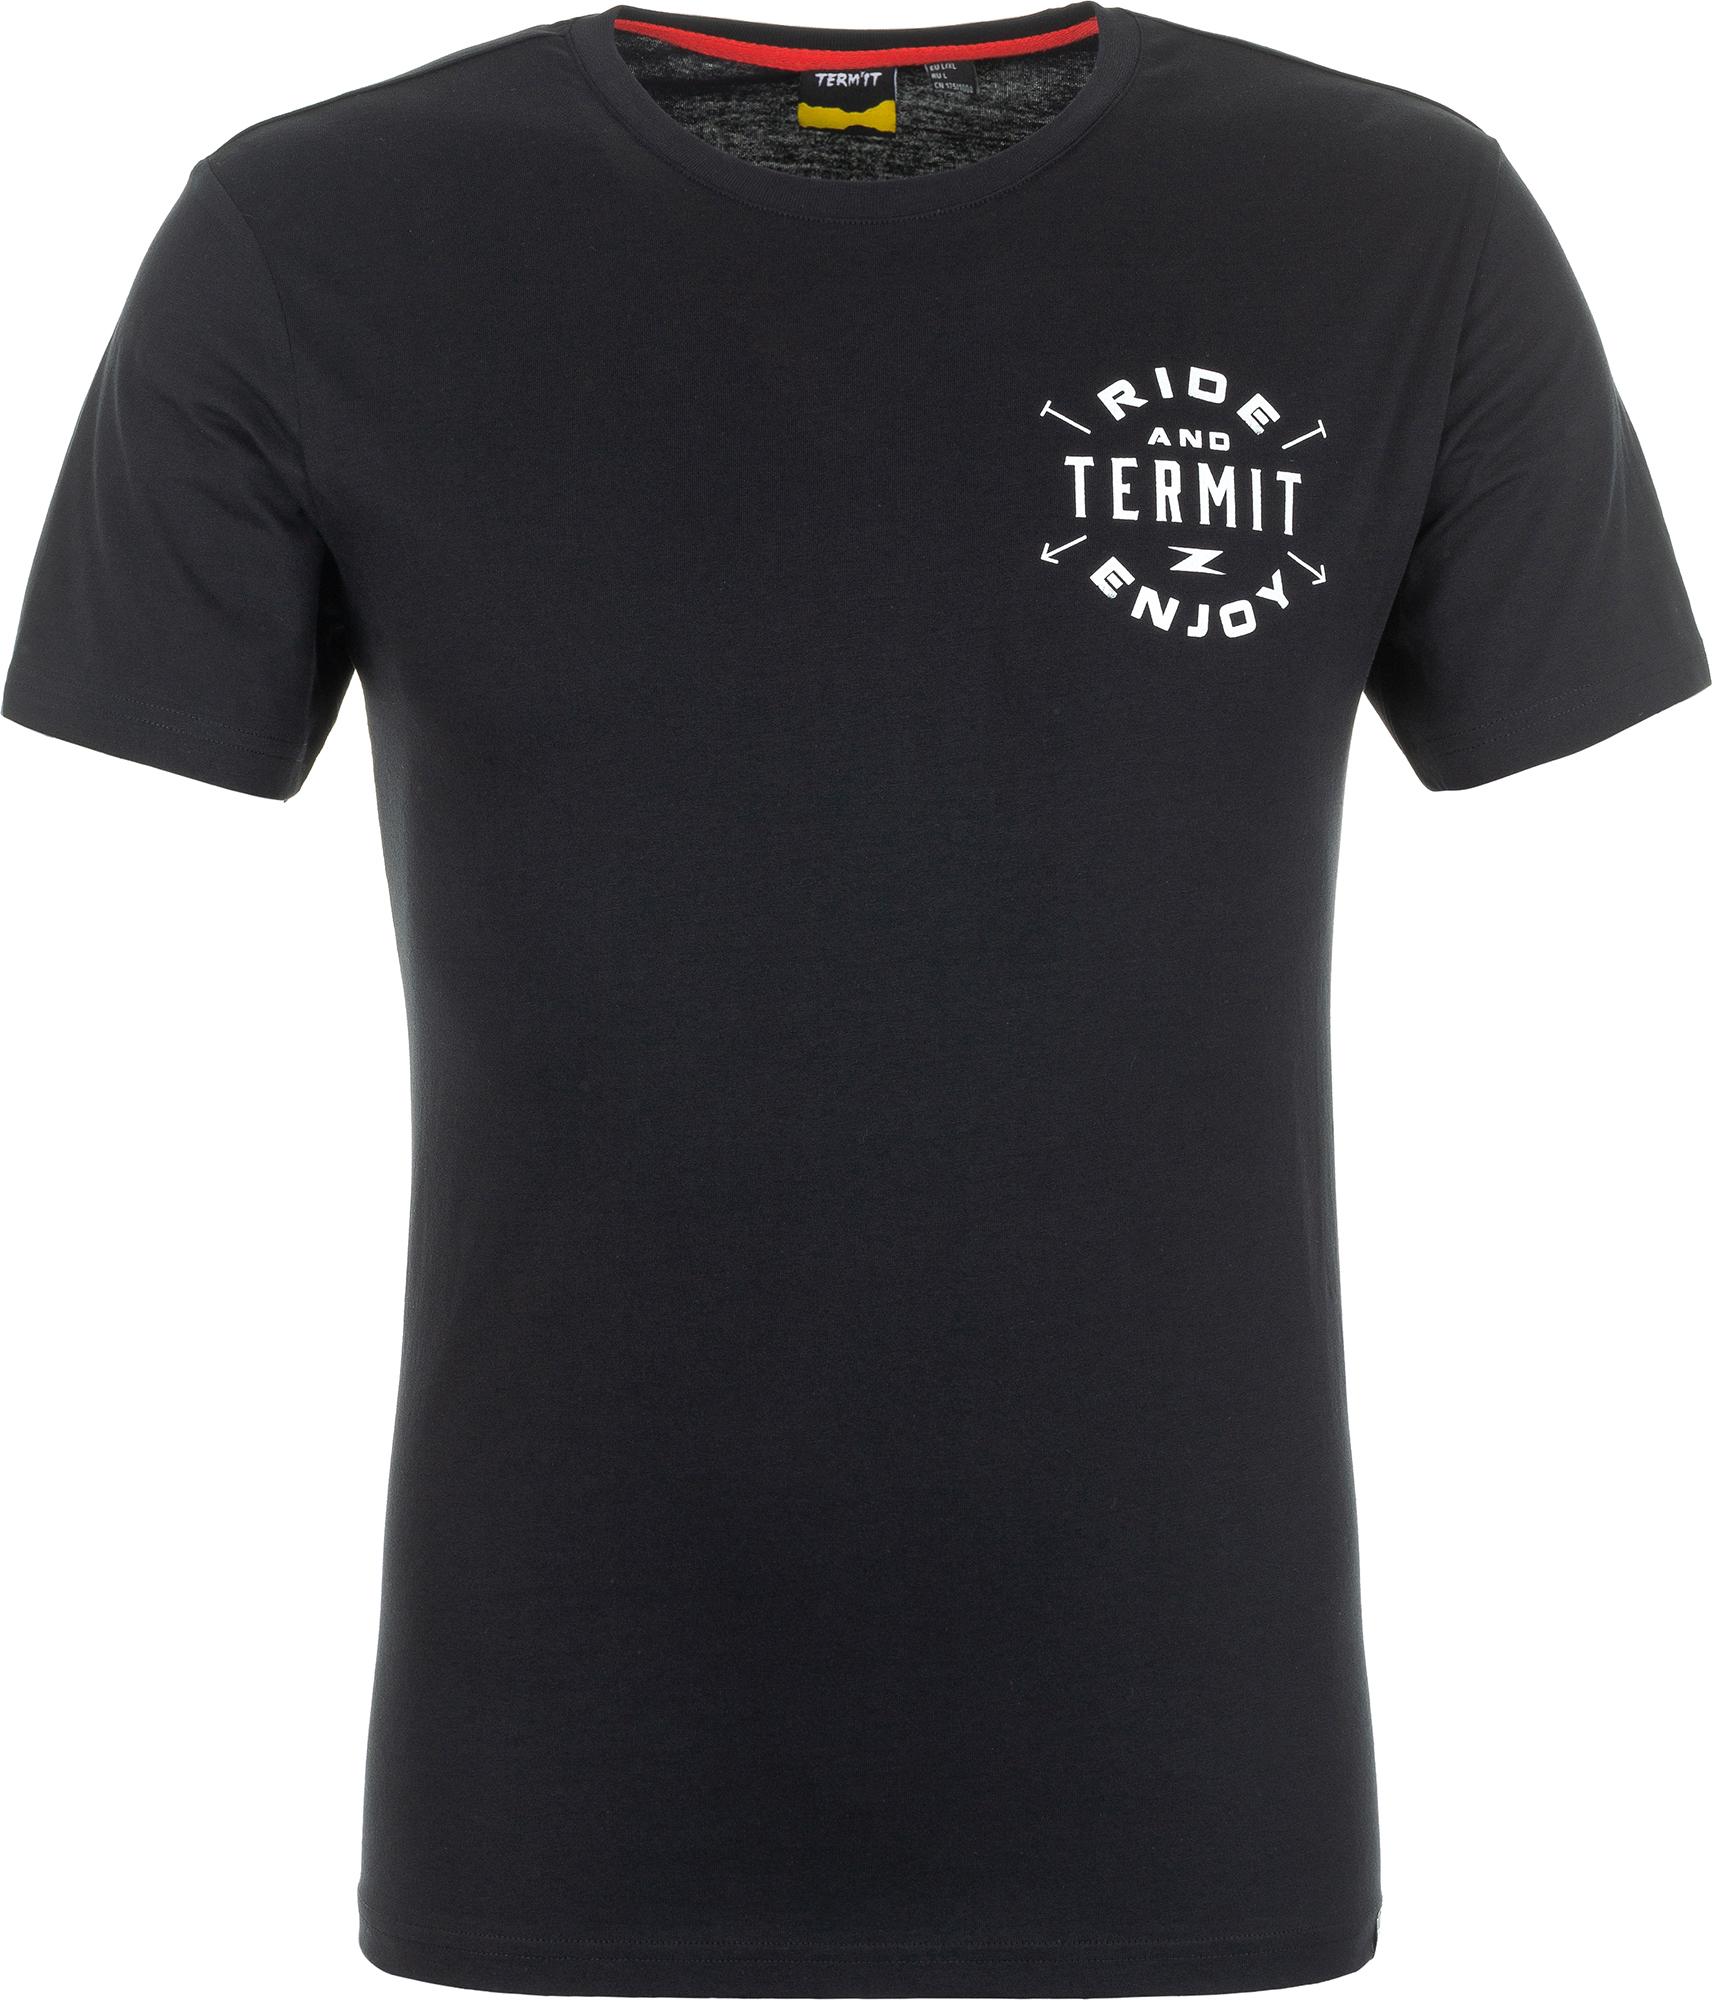 Termit Футболка мужская Termit, размер 48